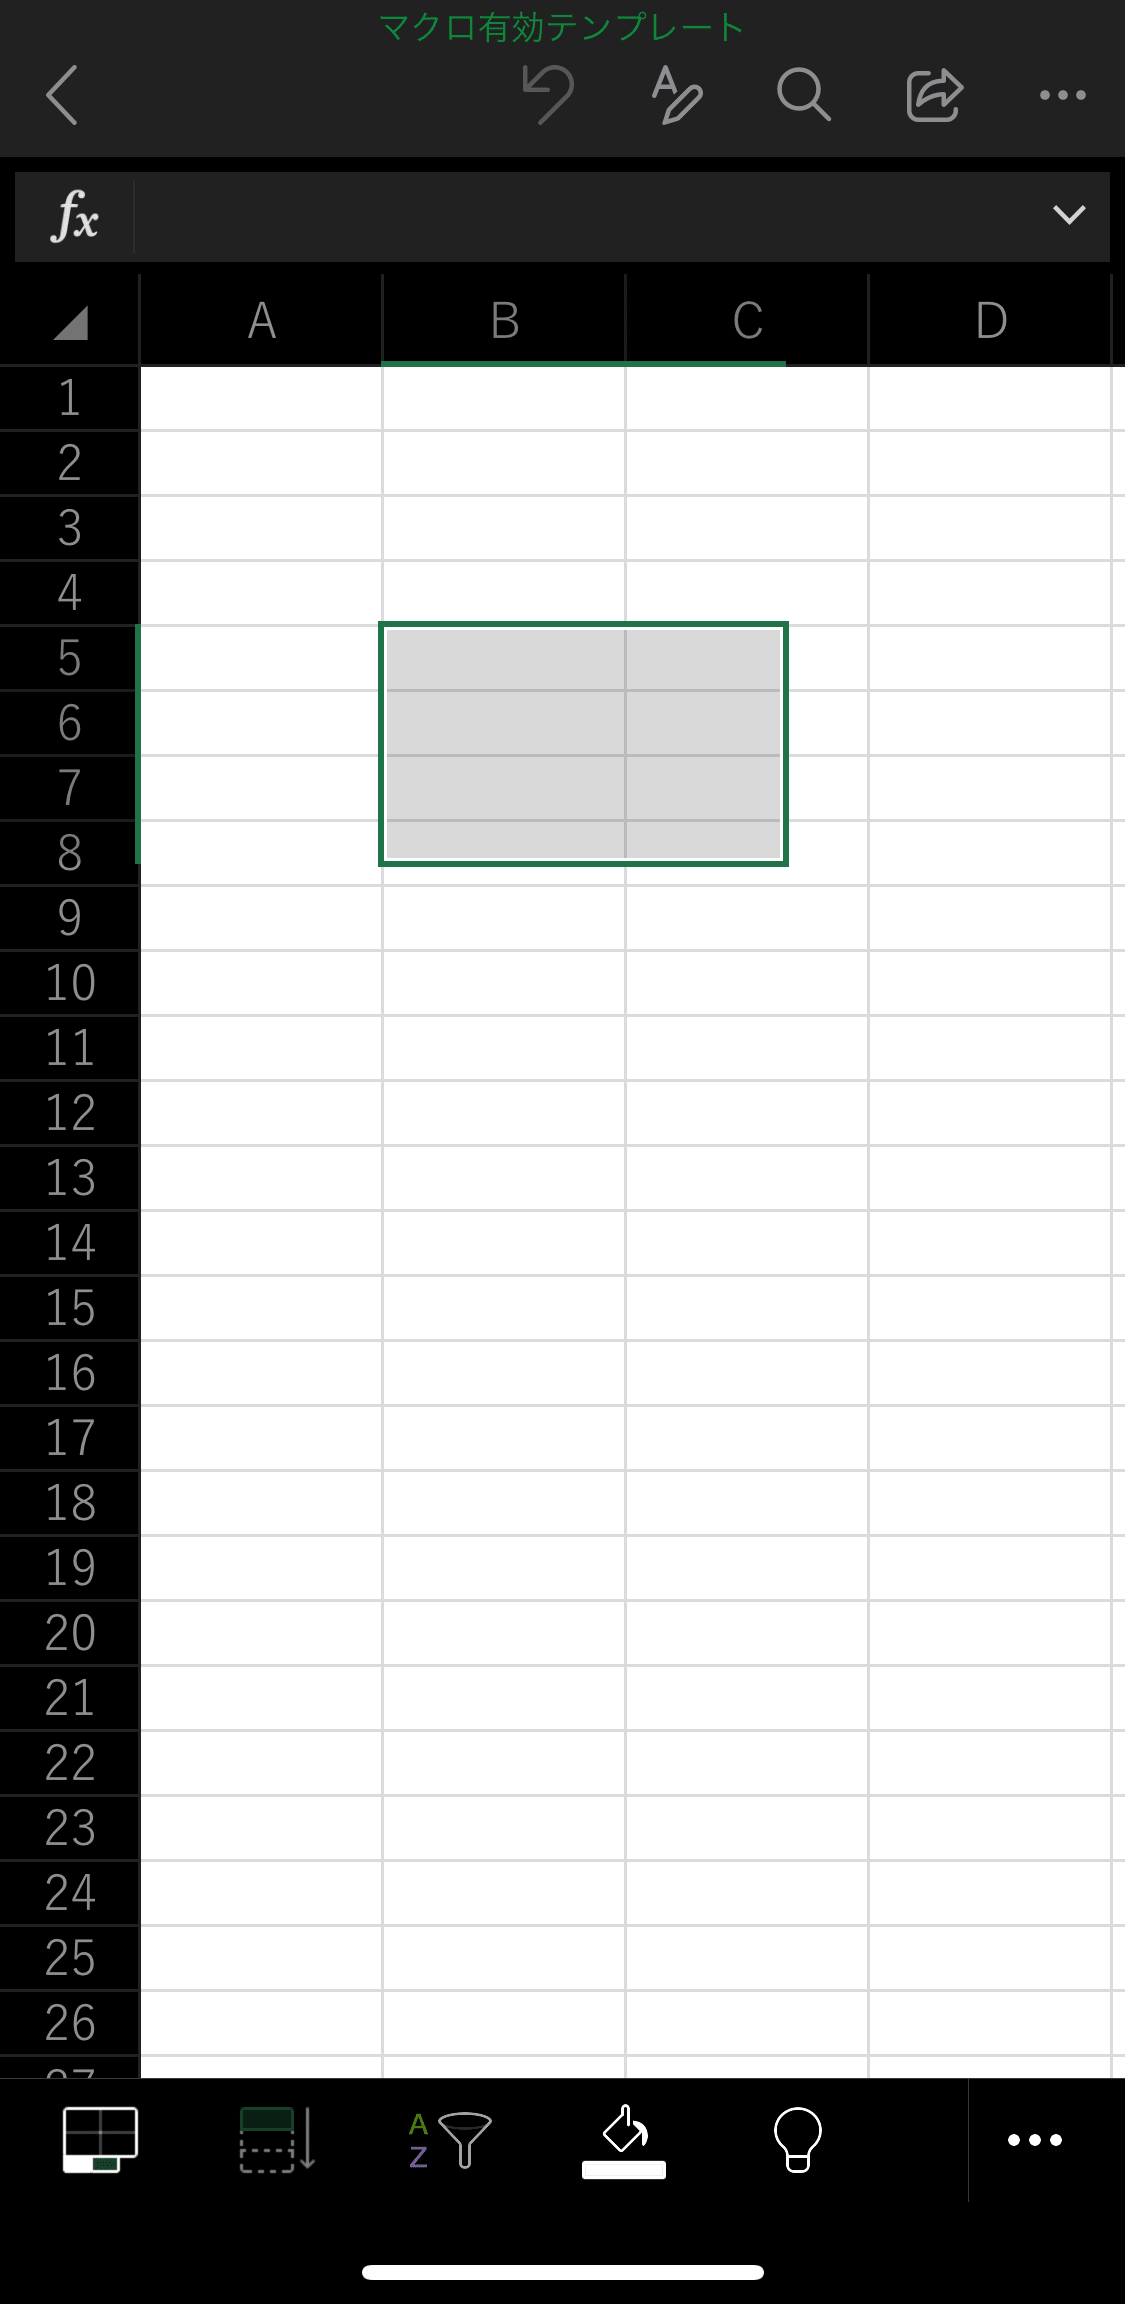 iPhoneでのエクセルアプリの使い方・編集方法・保存方法10